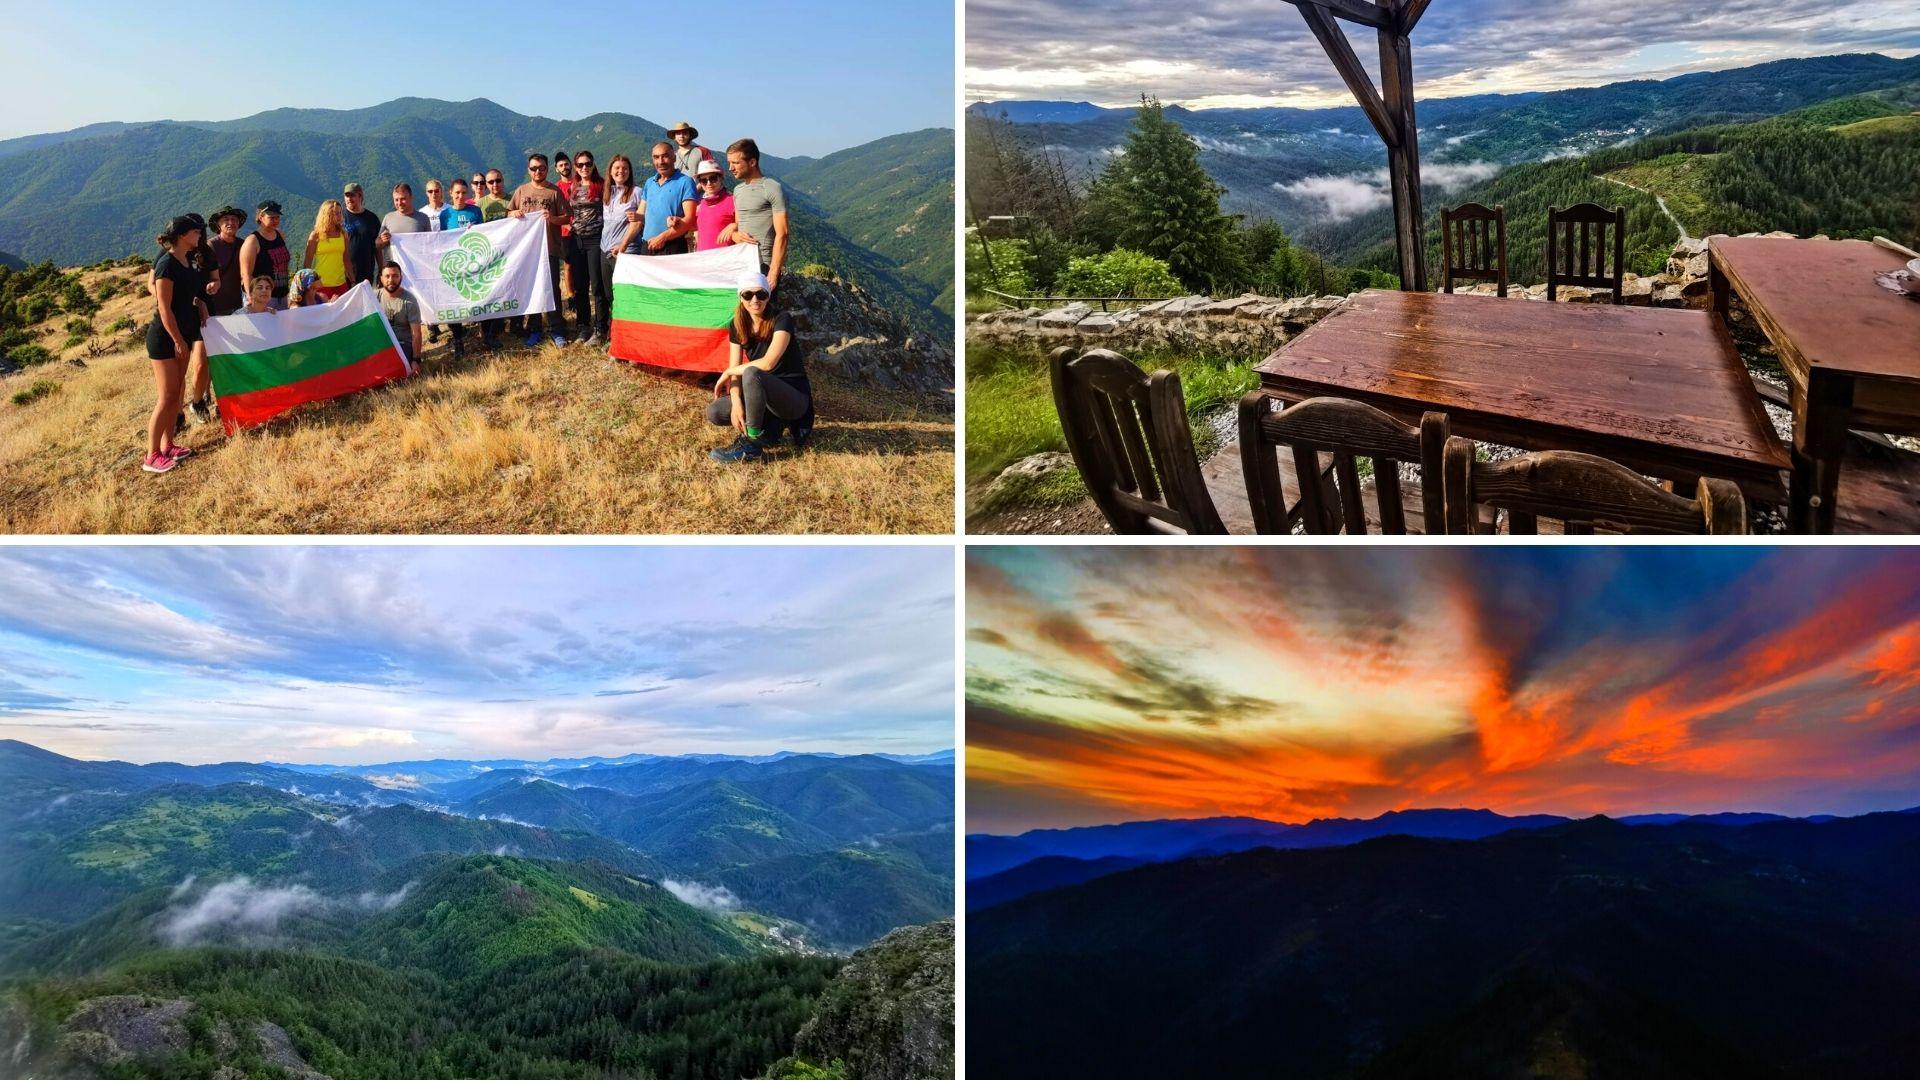 Родопите, водопади, Смолян, Момчилова крепост, Караджов Камък, почивка, преход